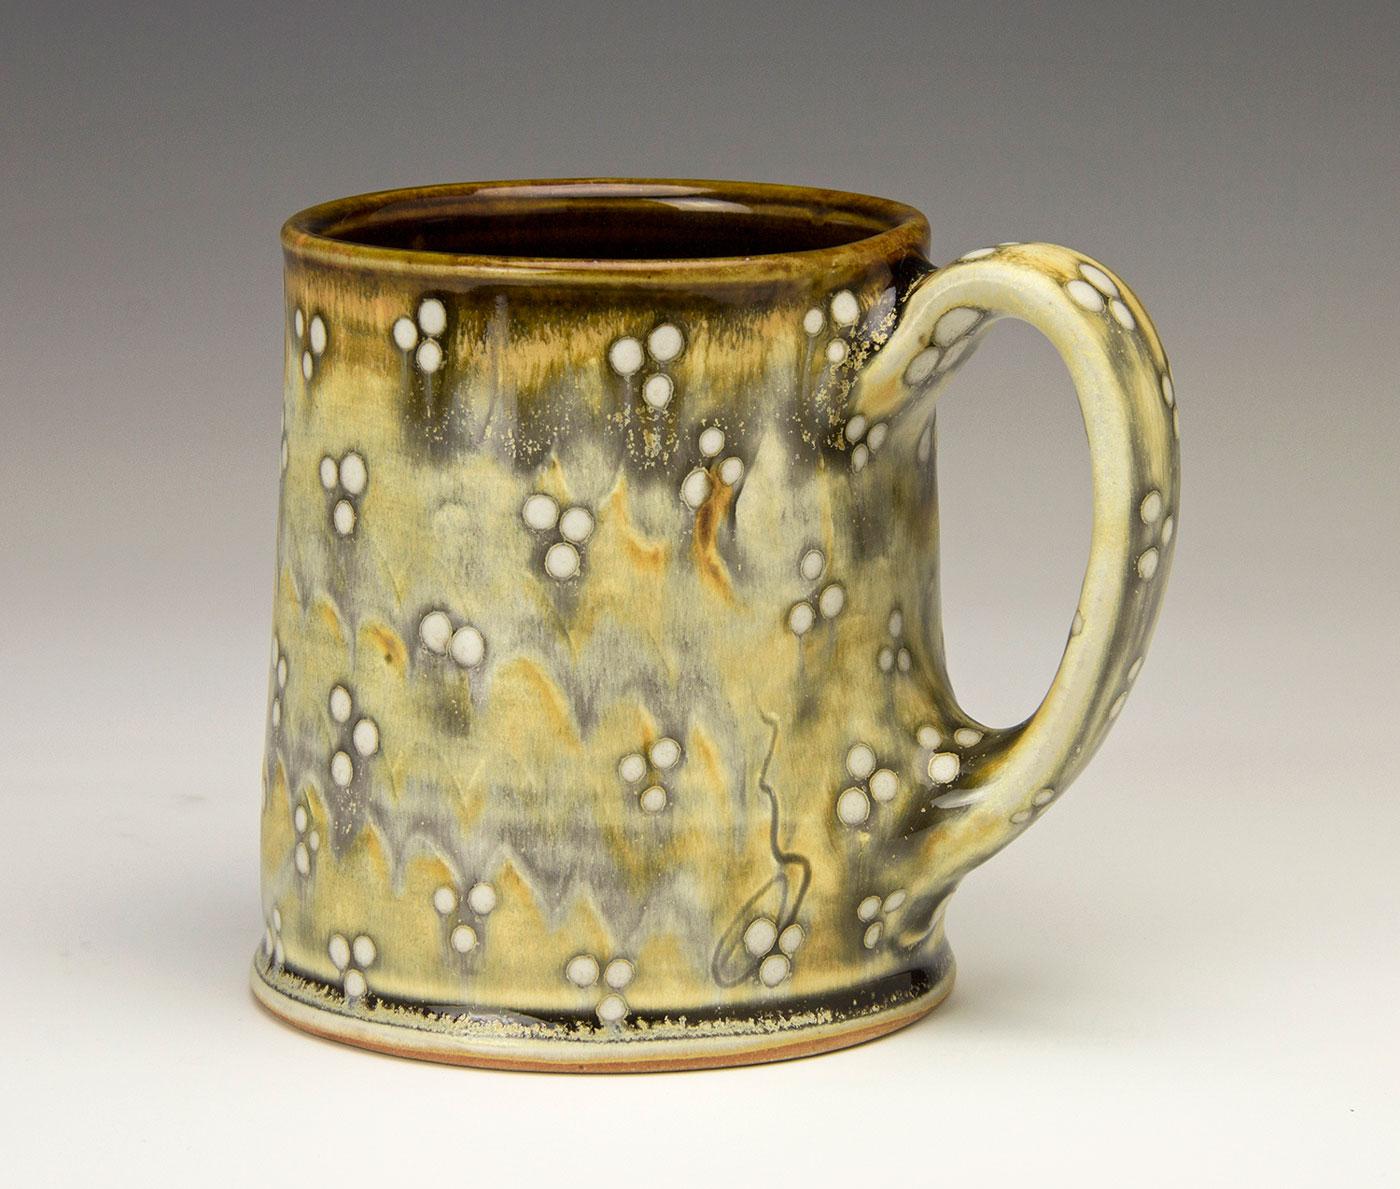 2016-Handmade-Mug-Studio-Pottery-Samantha-Henneke-Seagrove-North-Carolina.jpg